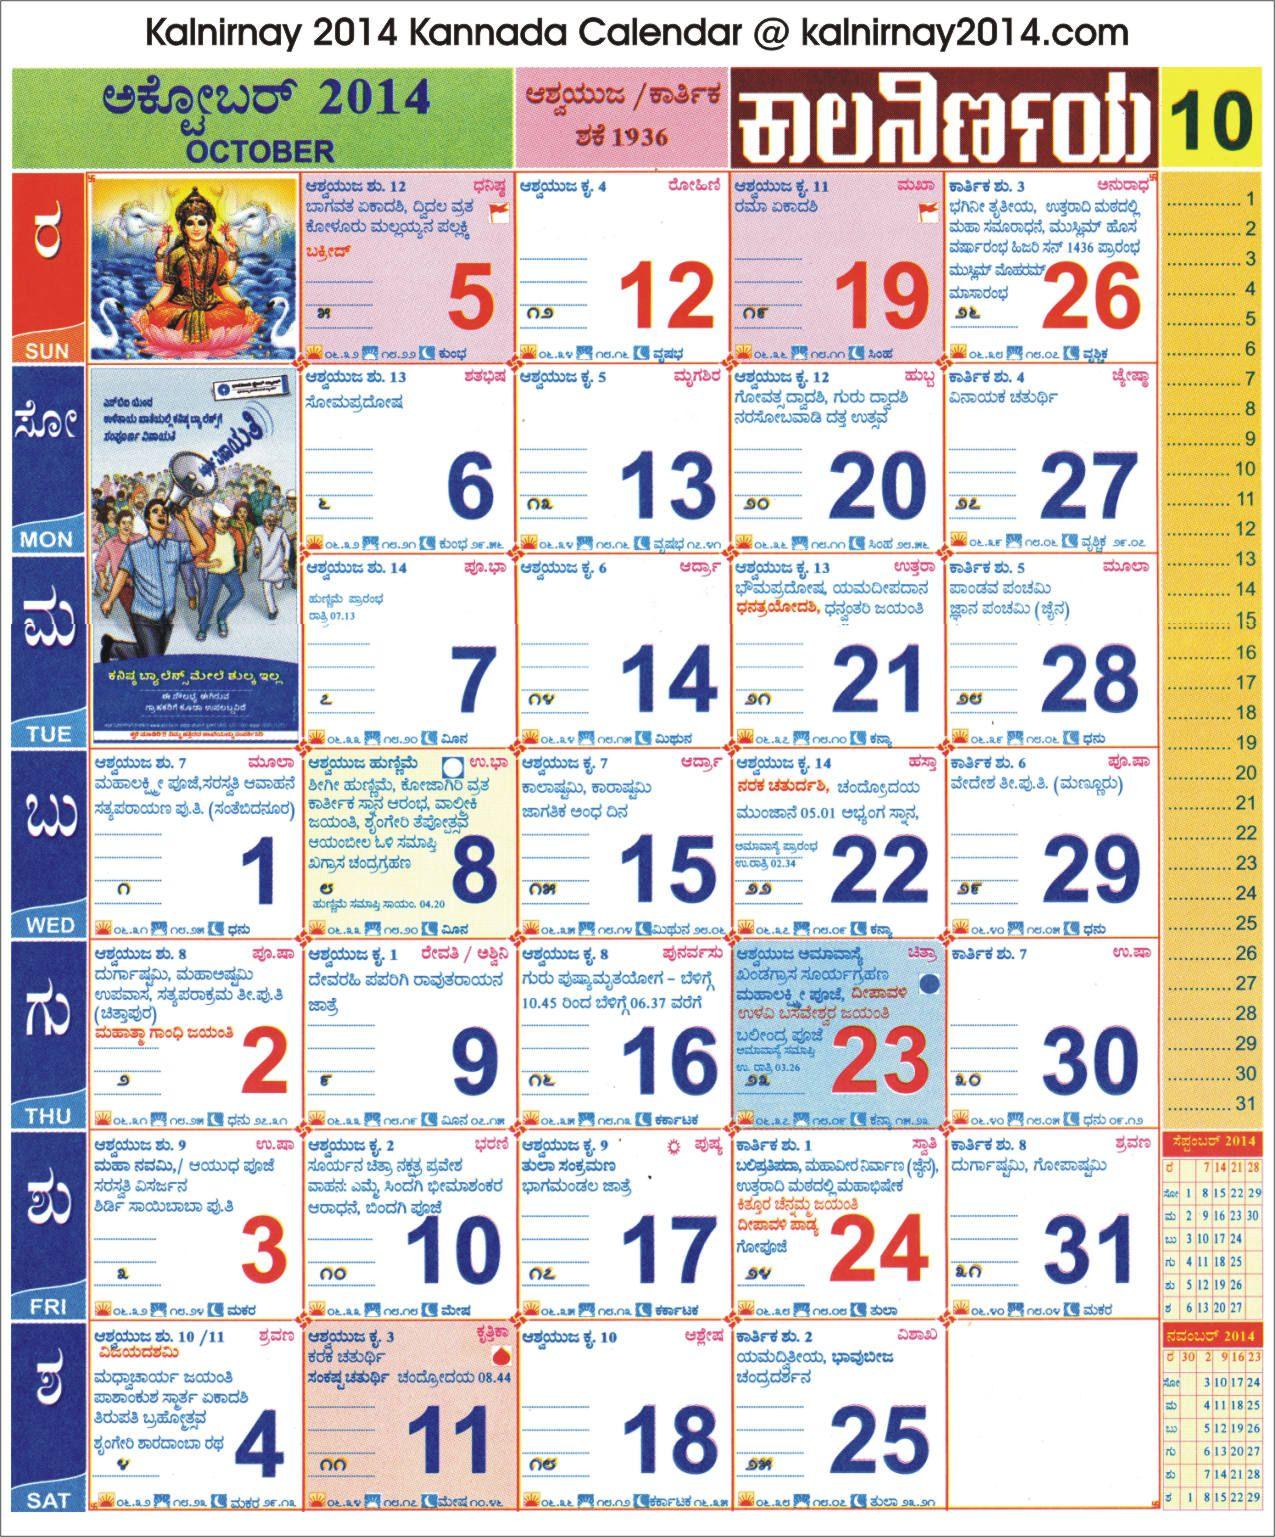 October 2014 Kannada kalnirnay Calendar | 2014 Kannada Kalnirnay ...